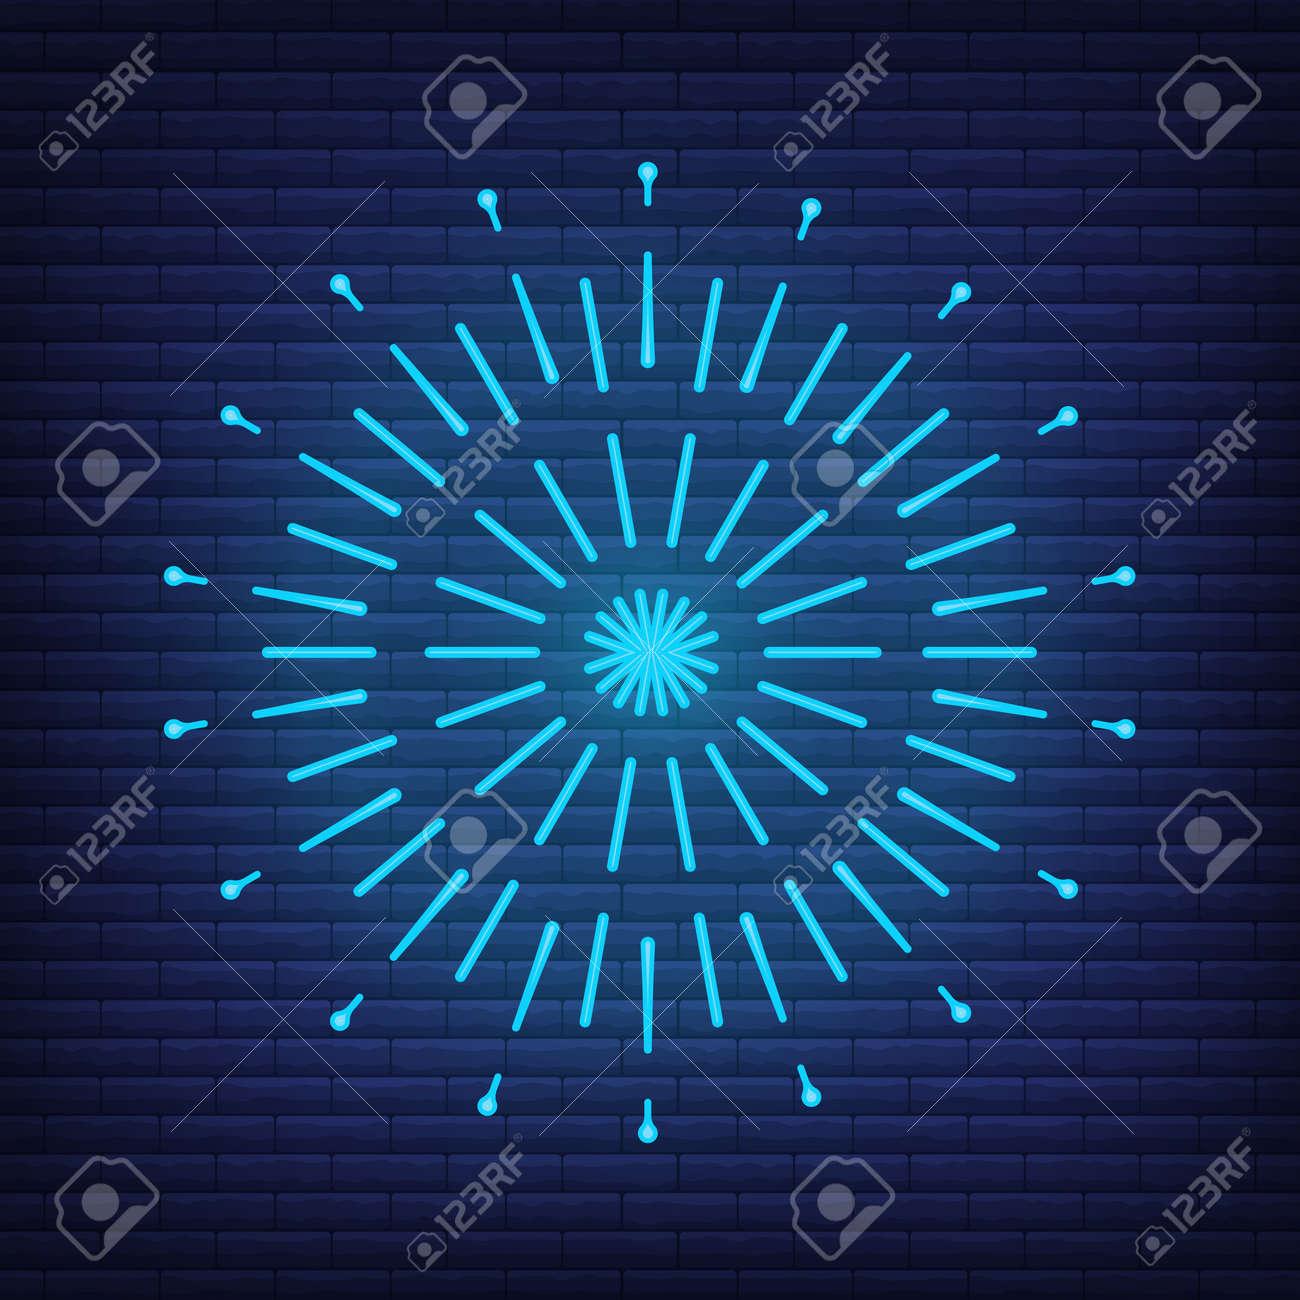 Retro design light sunburst neon style glow geometric shape, vintage rays sunlight explosion icon concept vector illustration, isolated on black wall. Minimal blue firework burst label, sunbeam badge. - 168394810